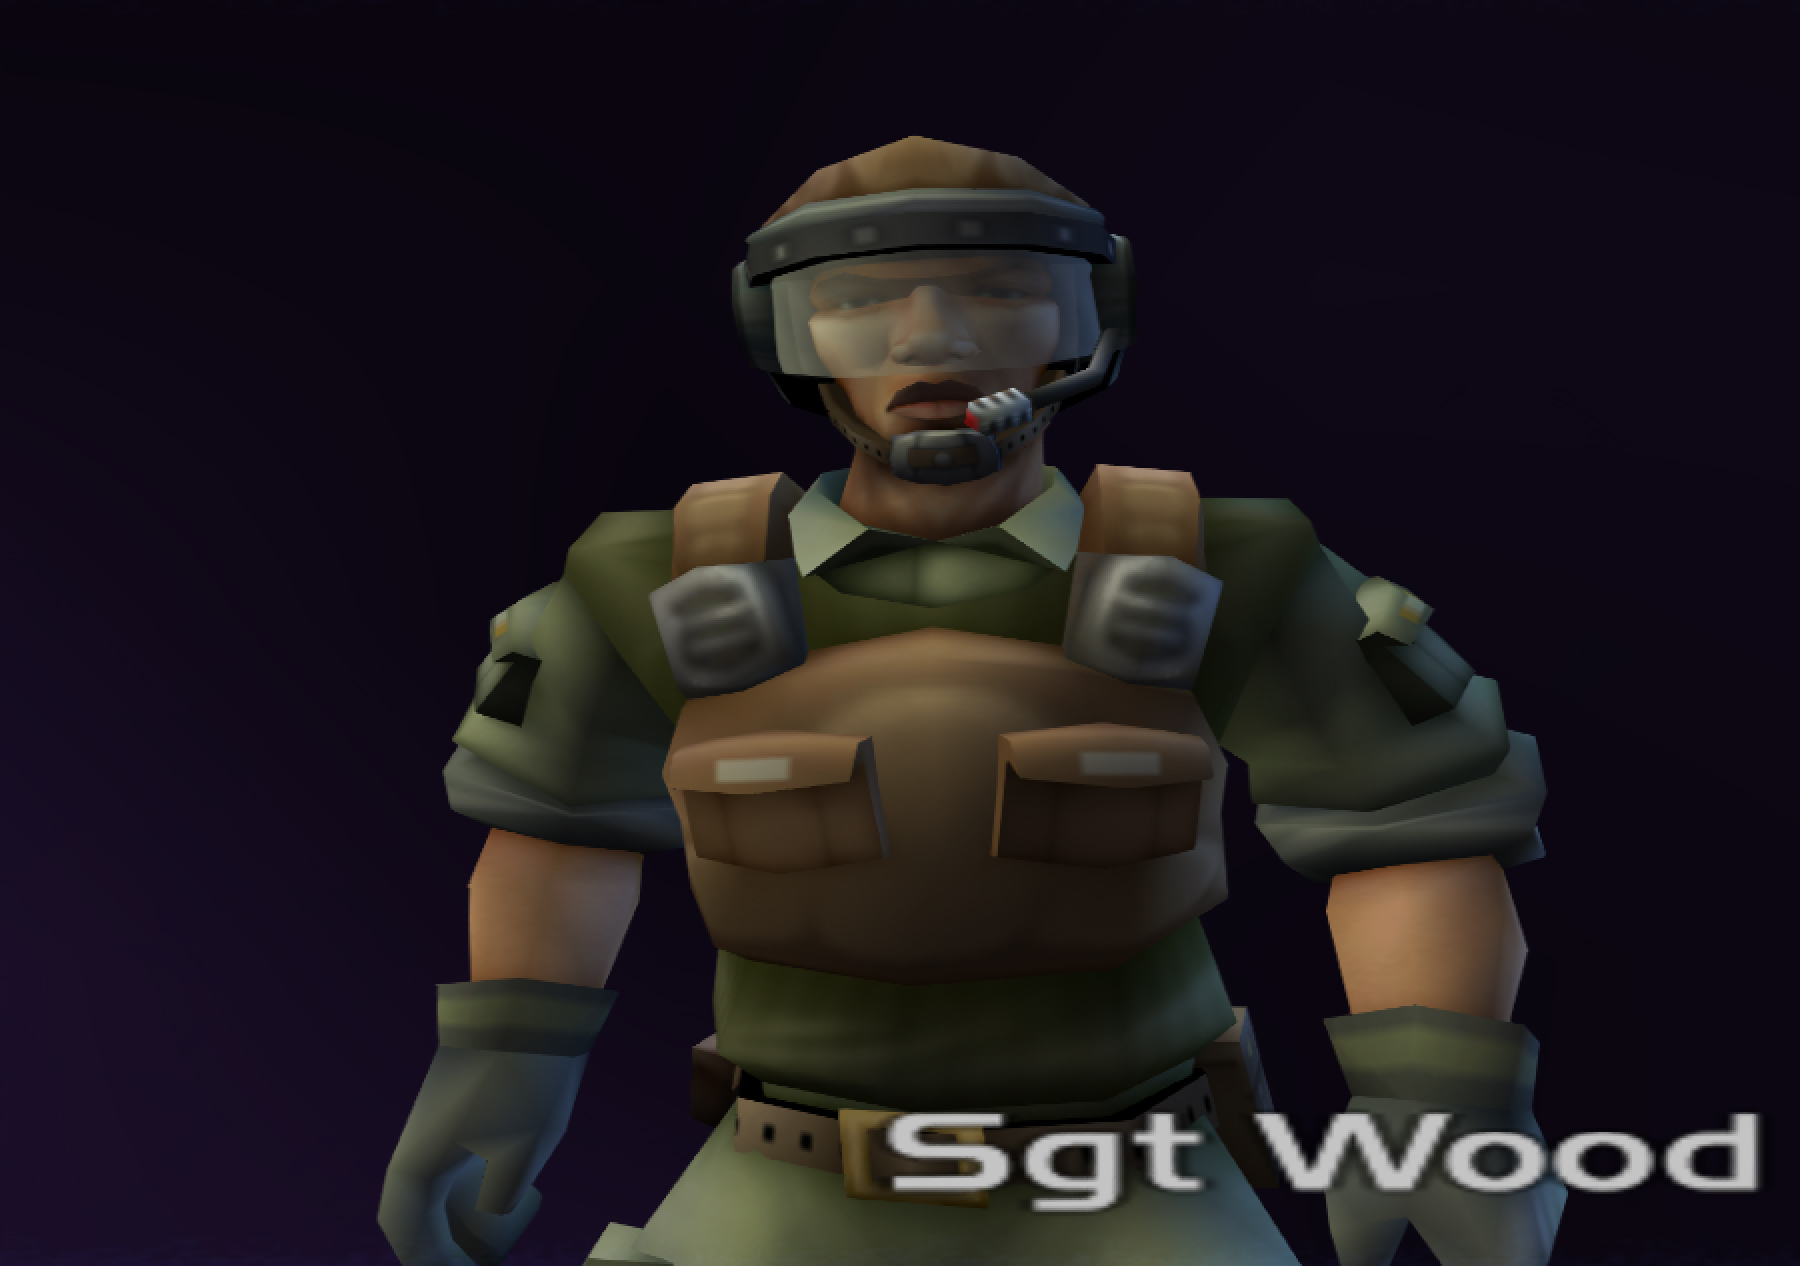 Sergeant Wood